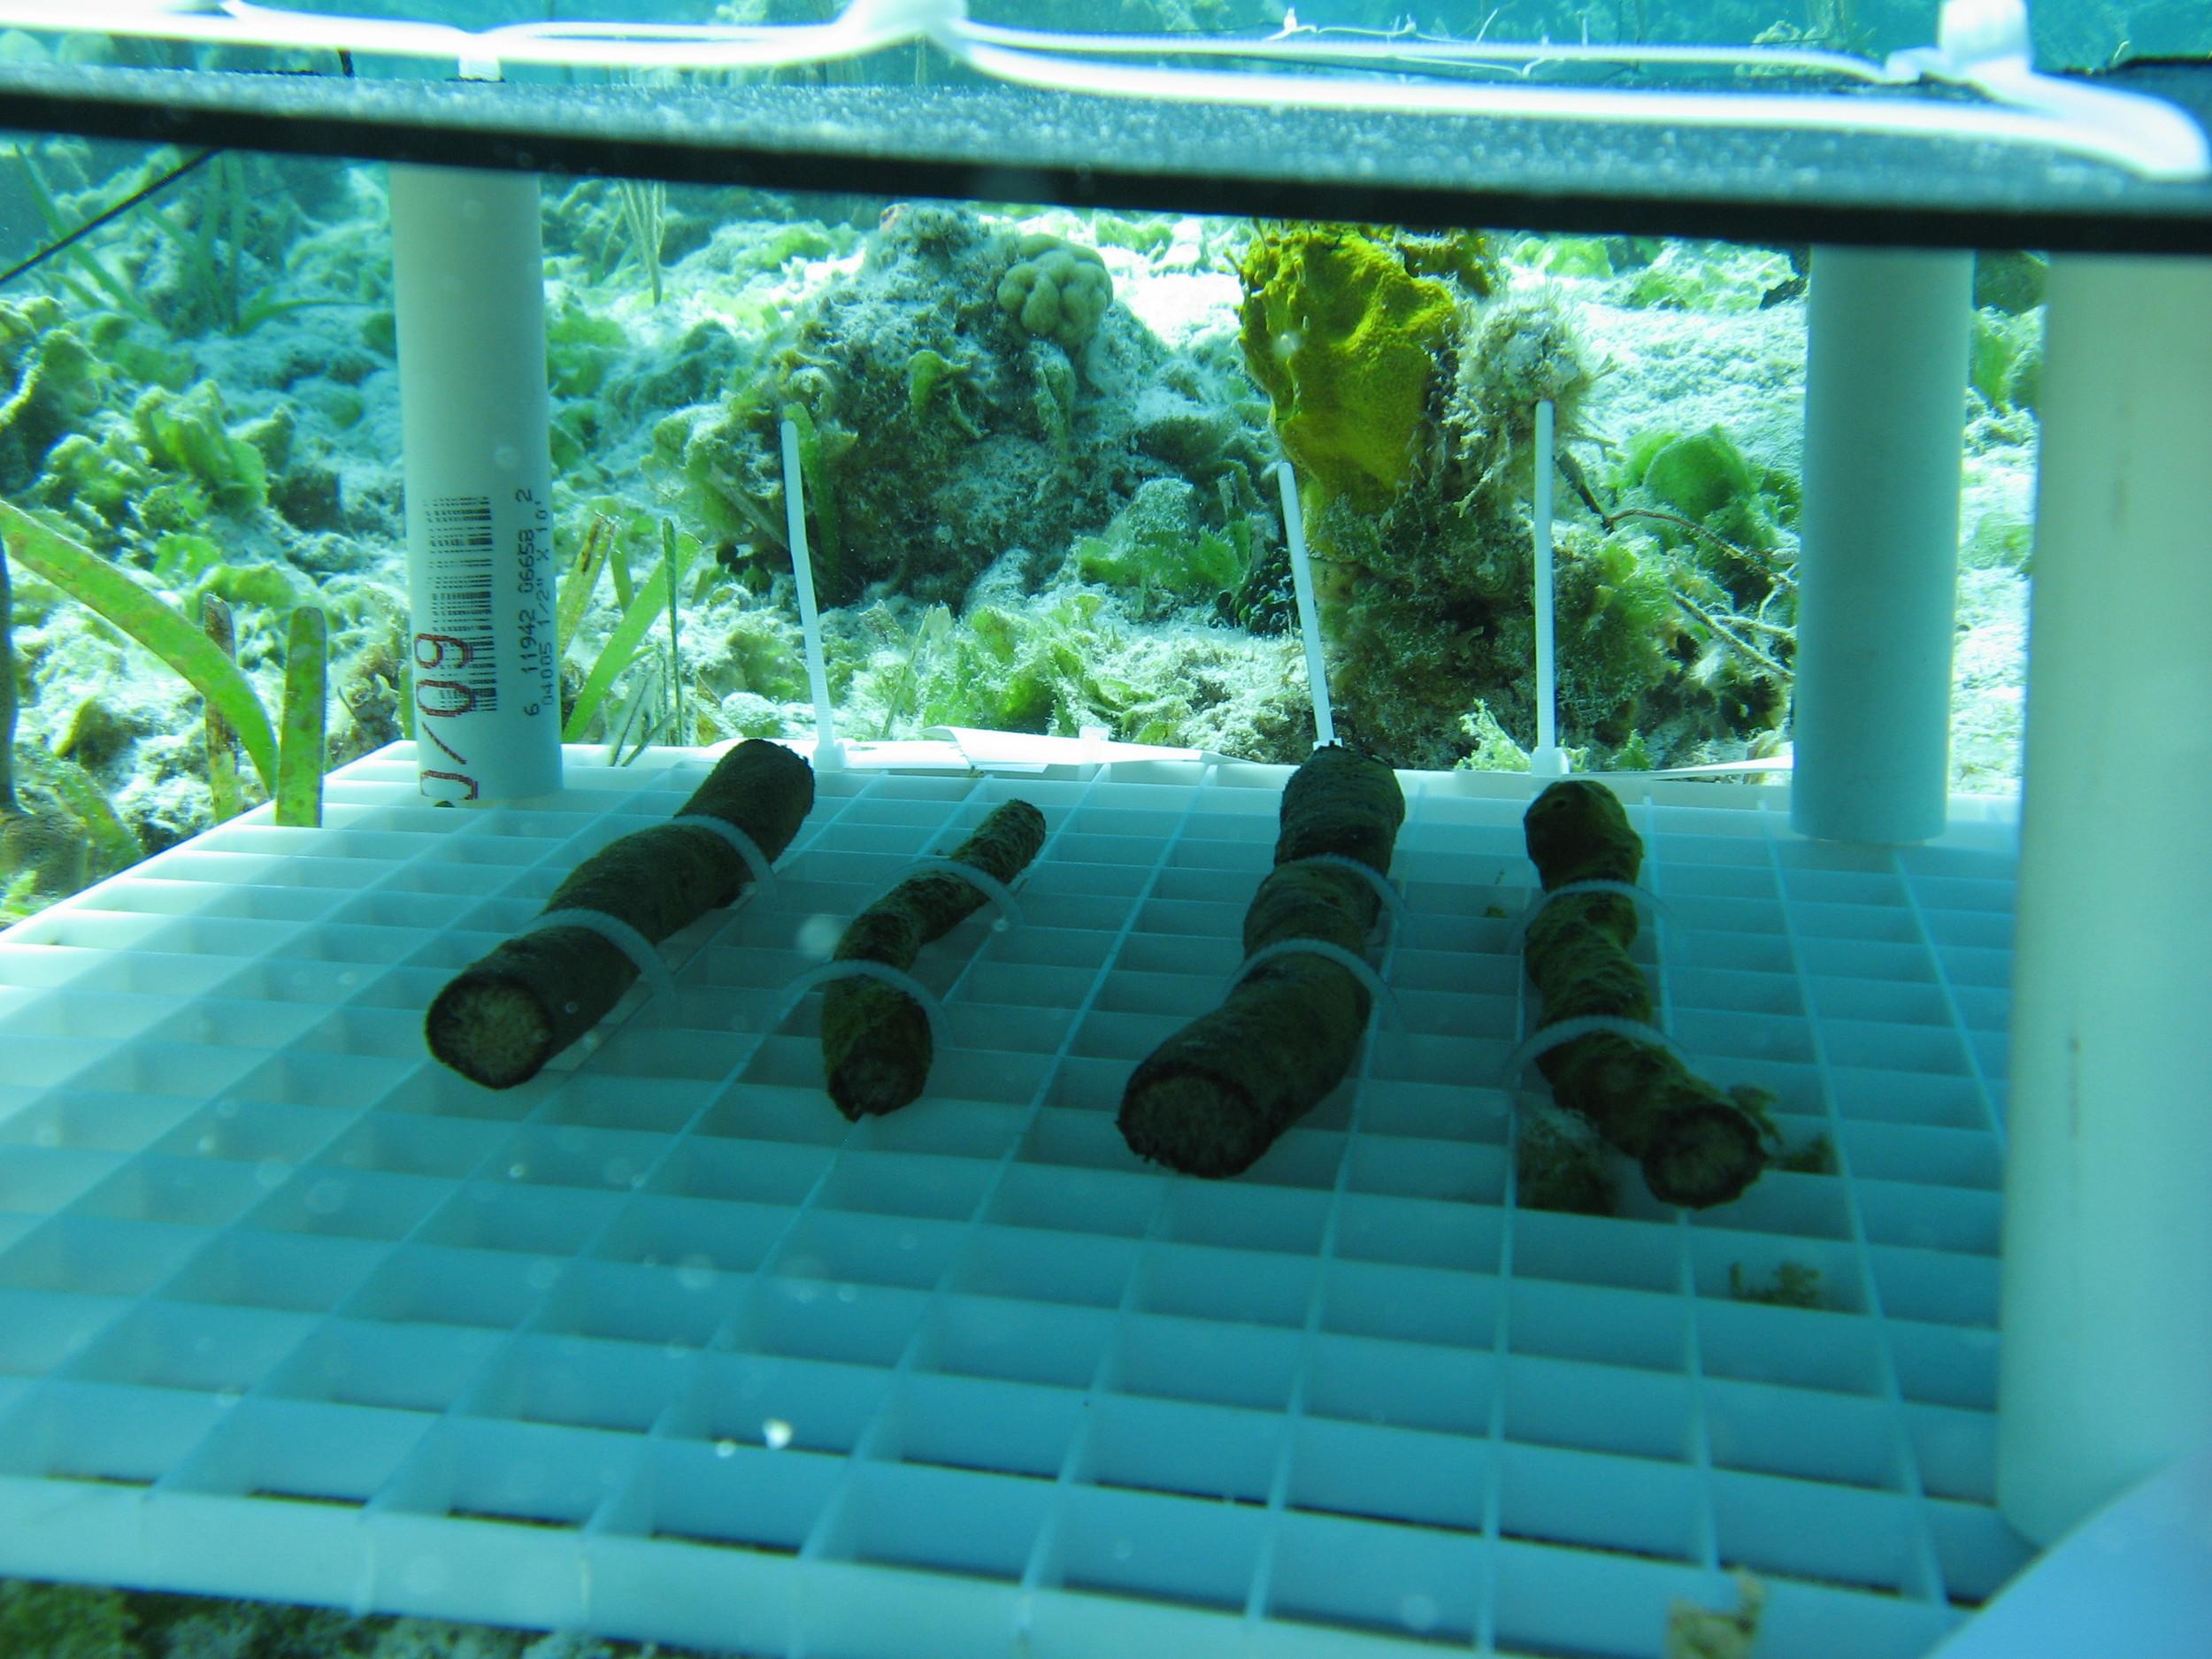 Shading experiment (shade or treatment canopy) in Bocas del Toro, Panama.